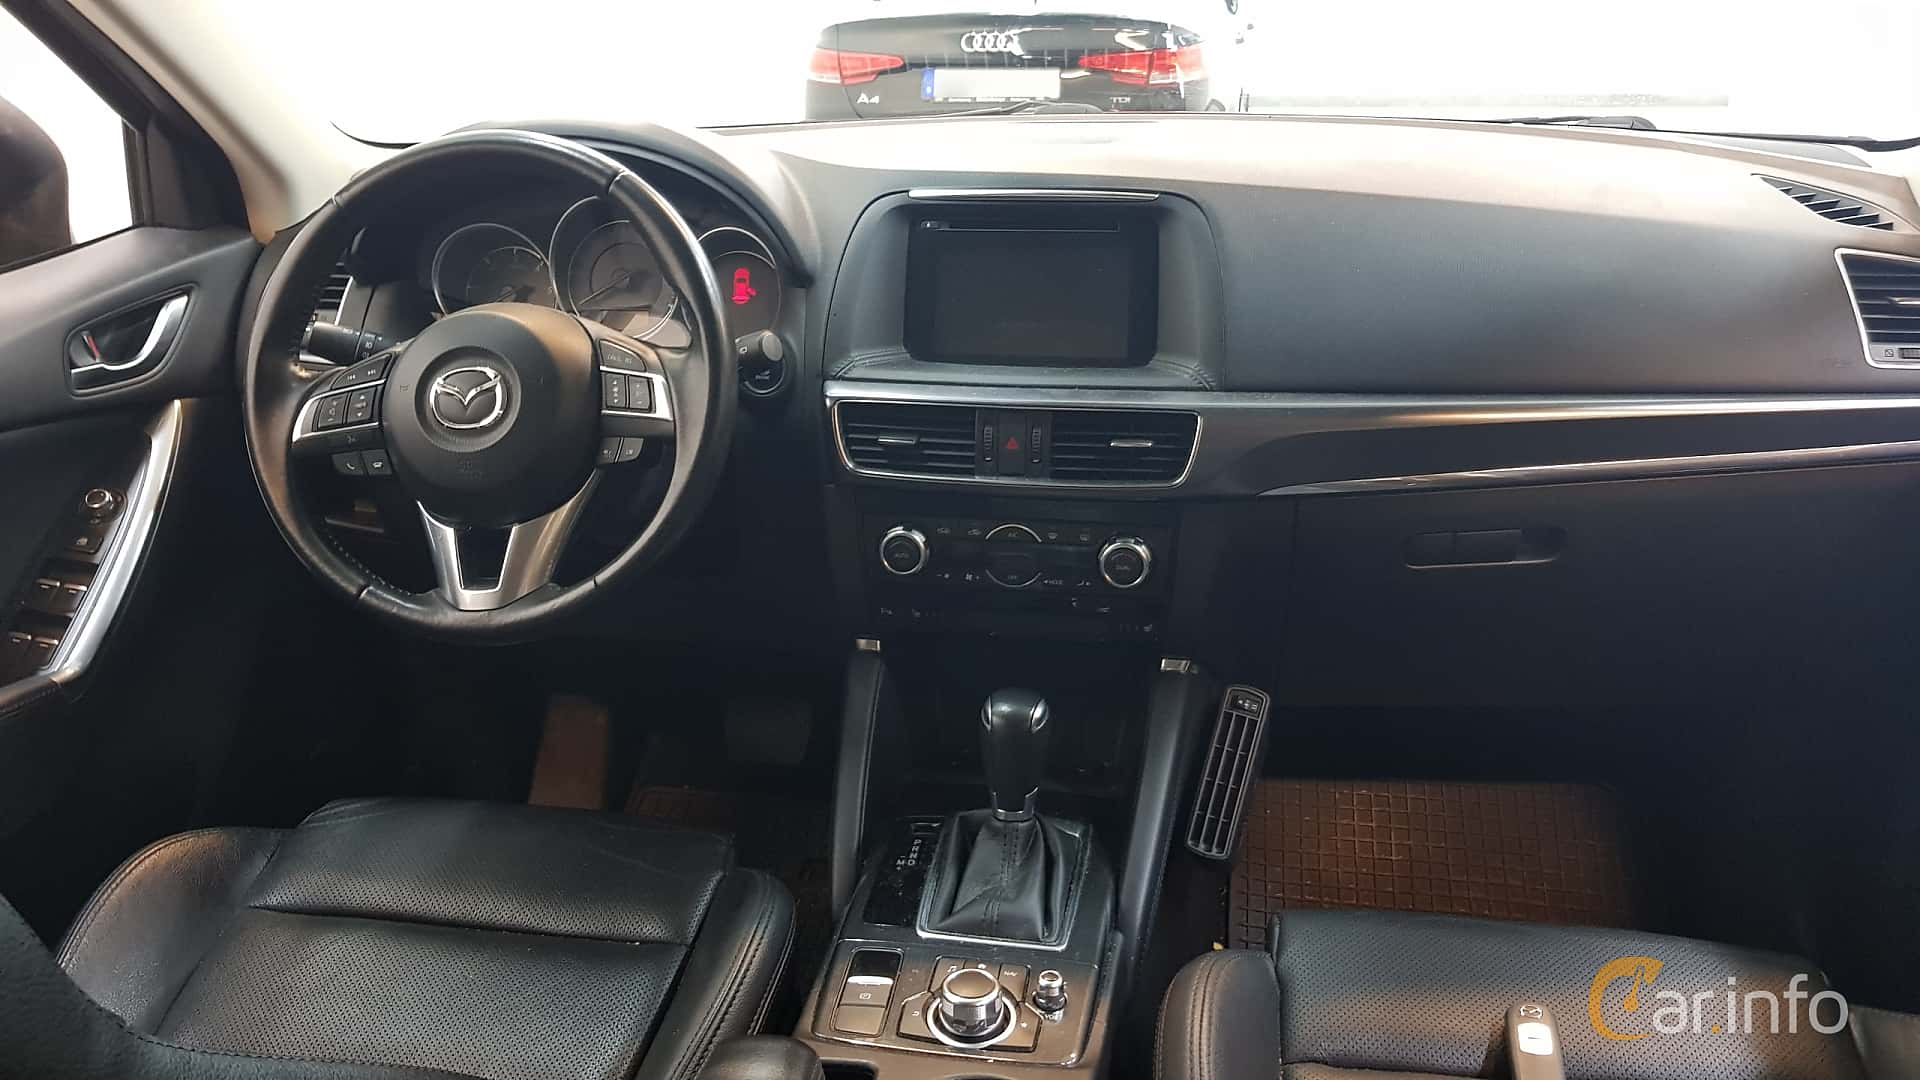 Mazda CX 5 2.2 SKYACTIV D AWD Automatic, 175hp, 2015